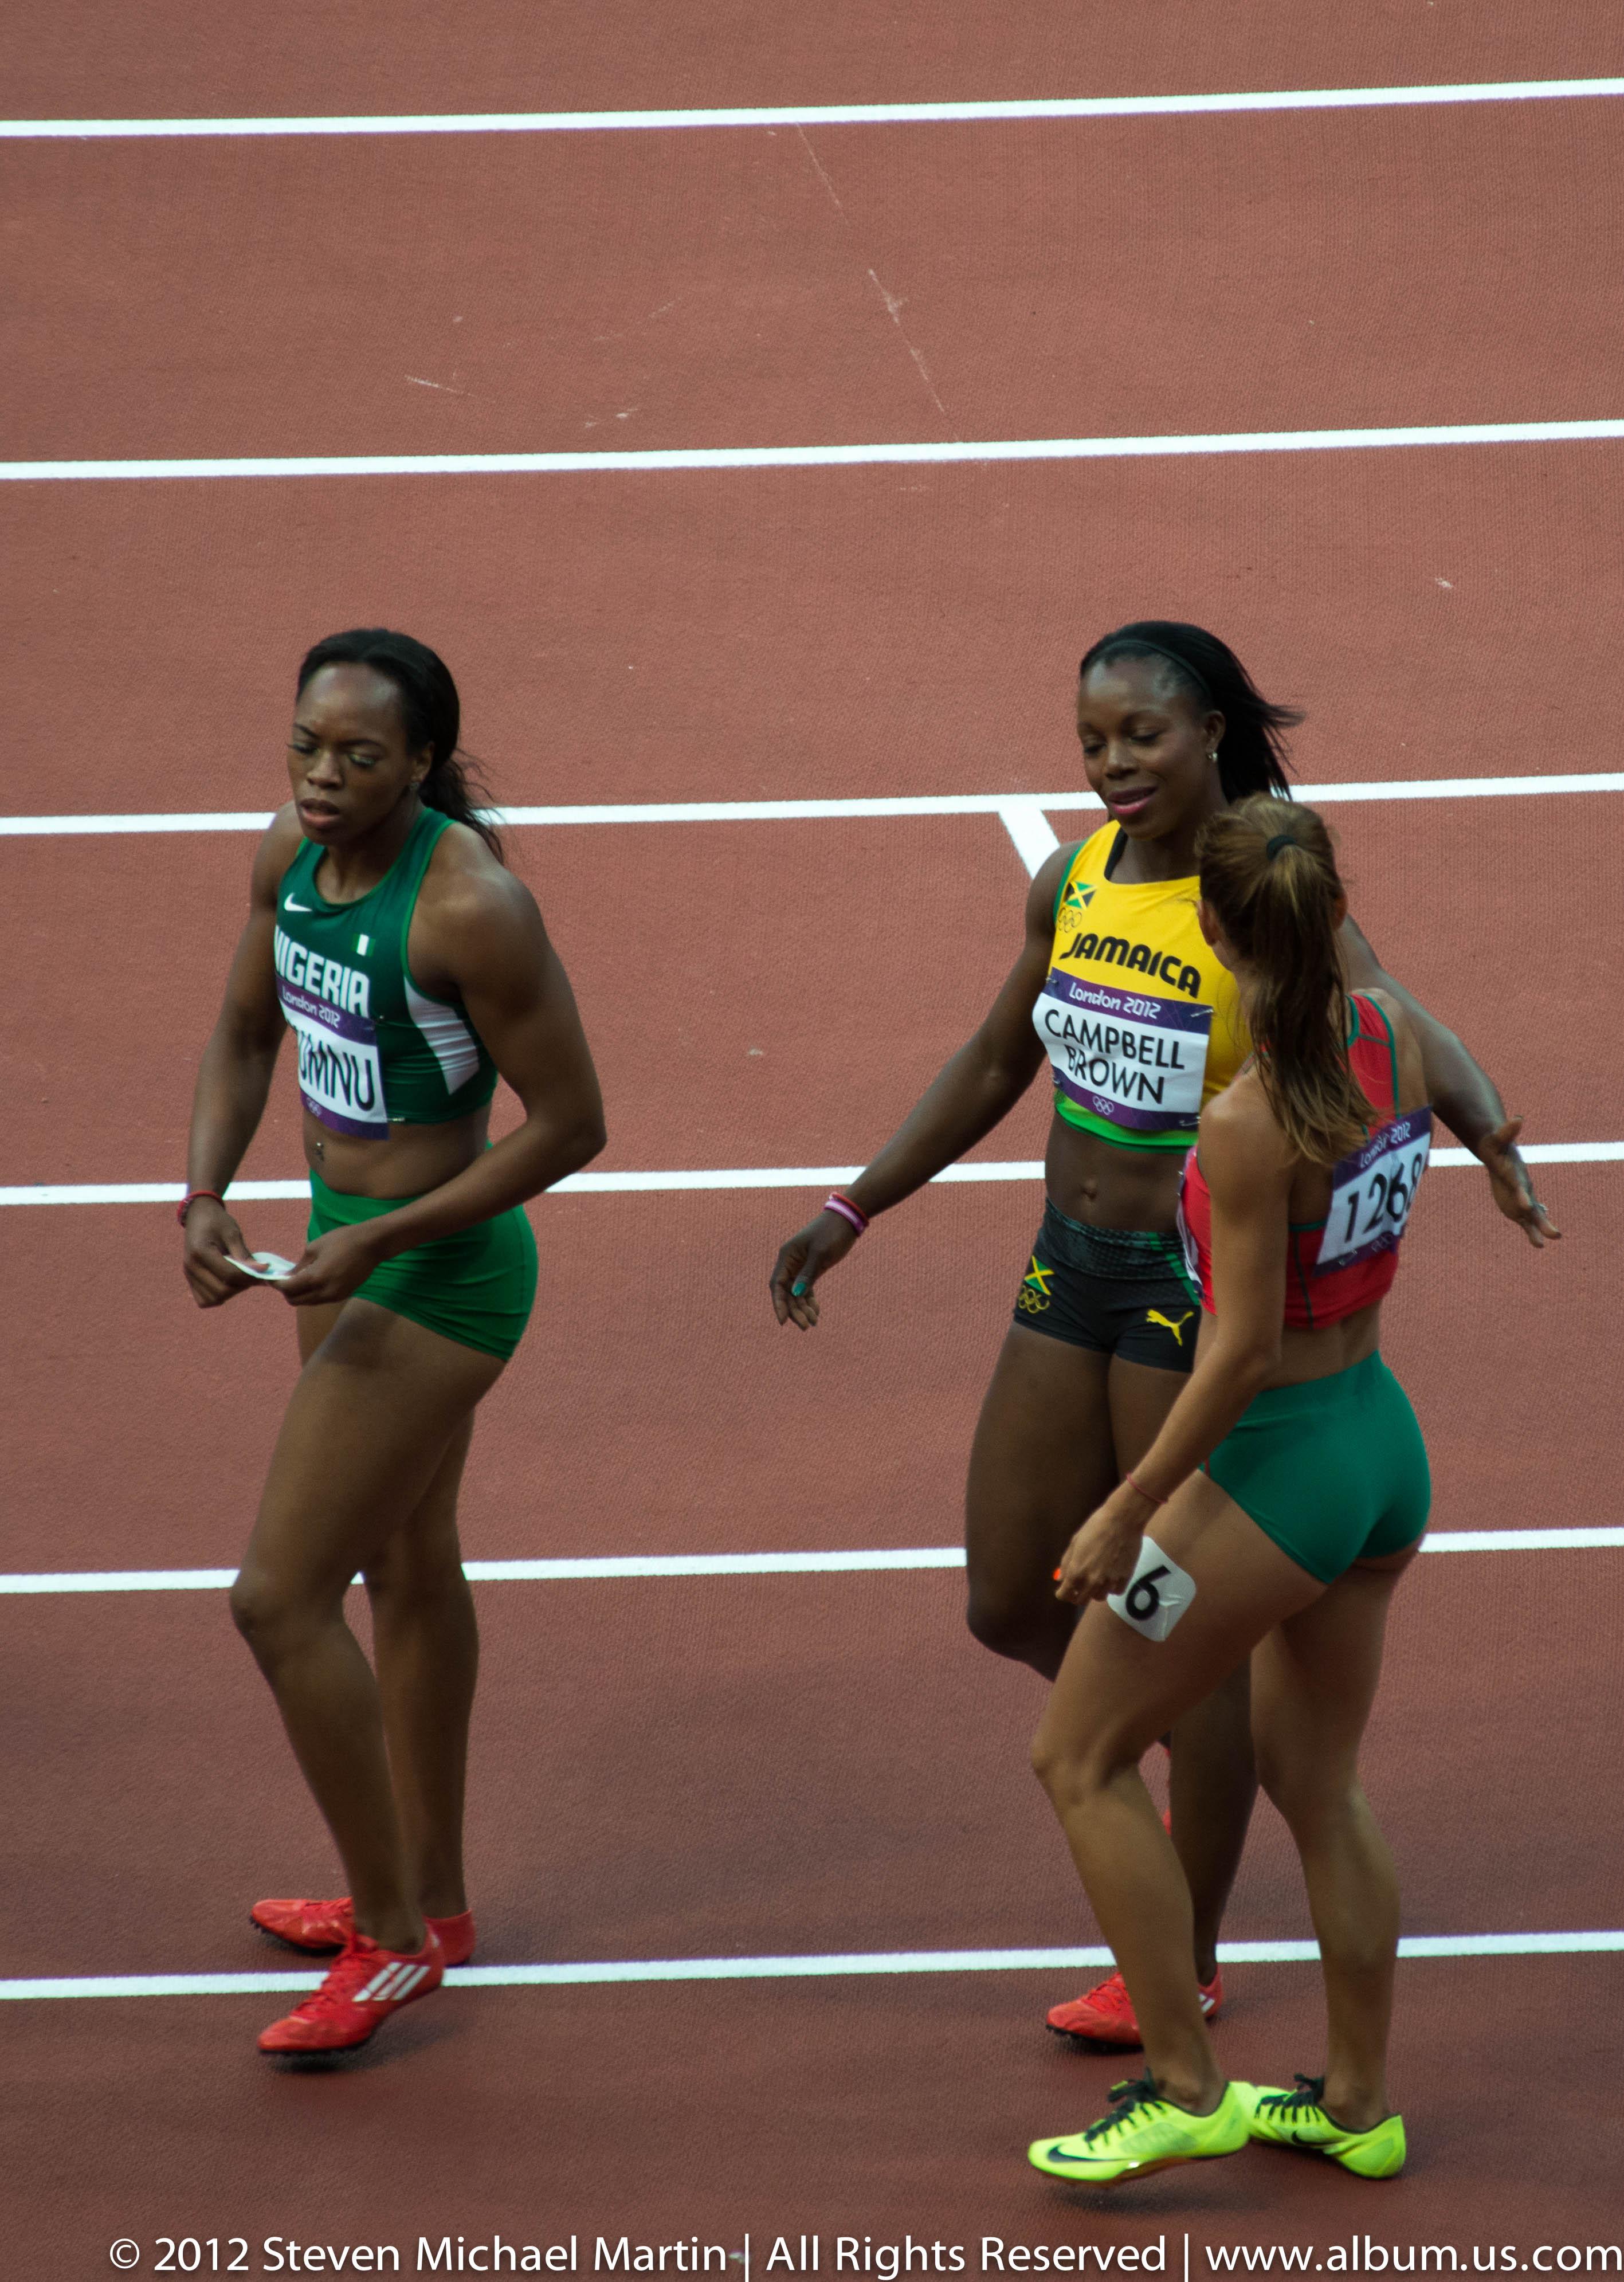 SMartin_2012 Olympics Athletics_20120803_015